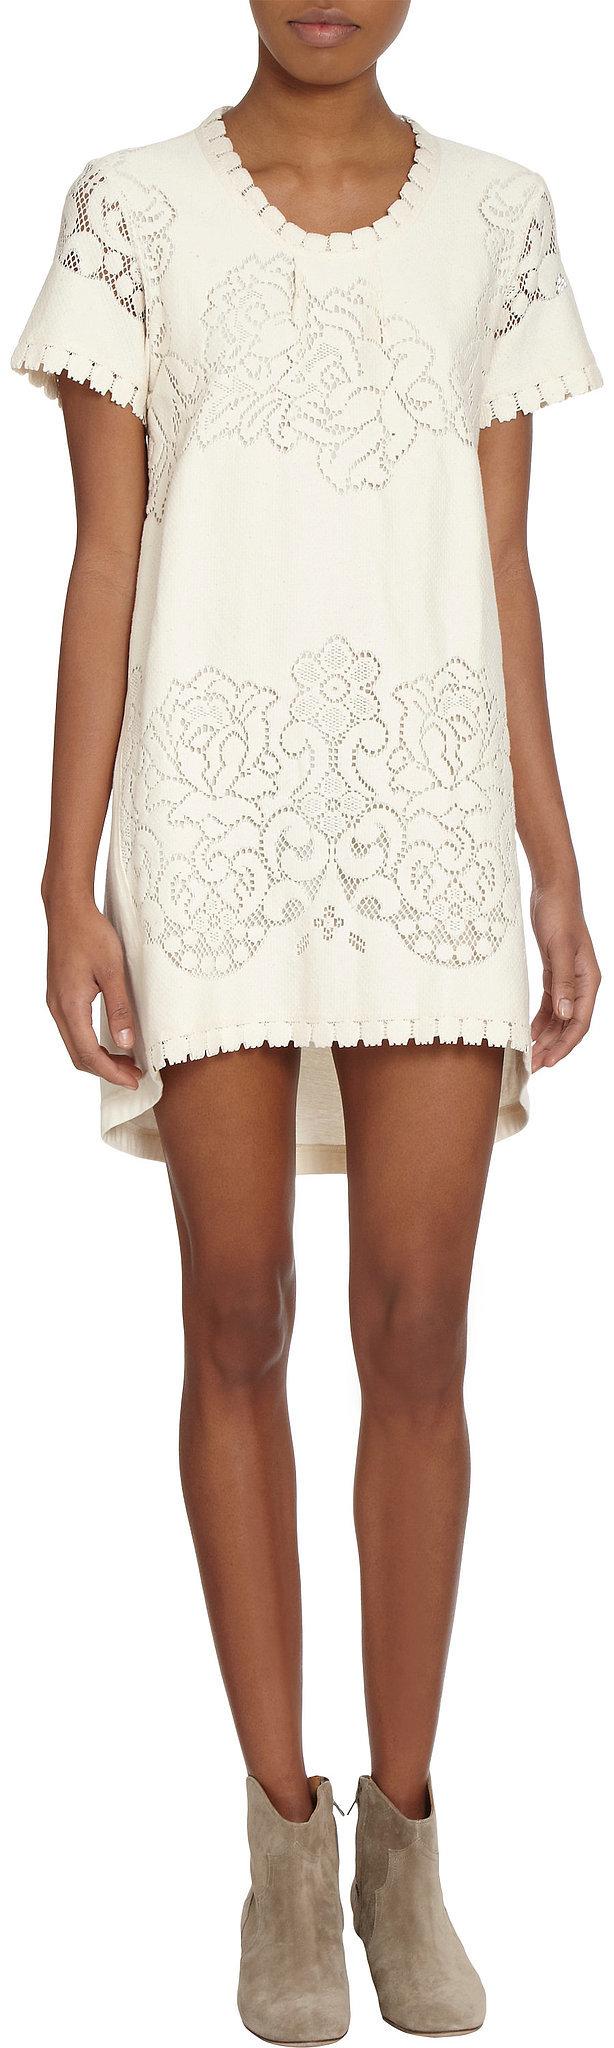 Sea Lace Front White Dress